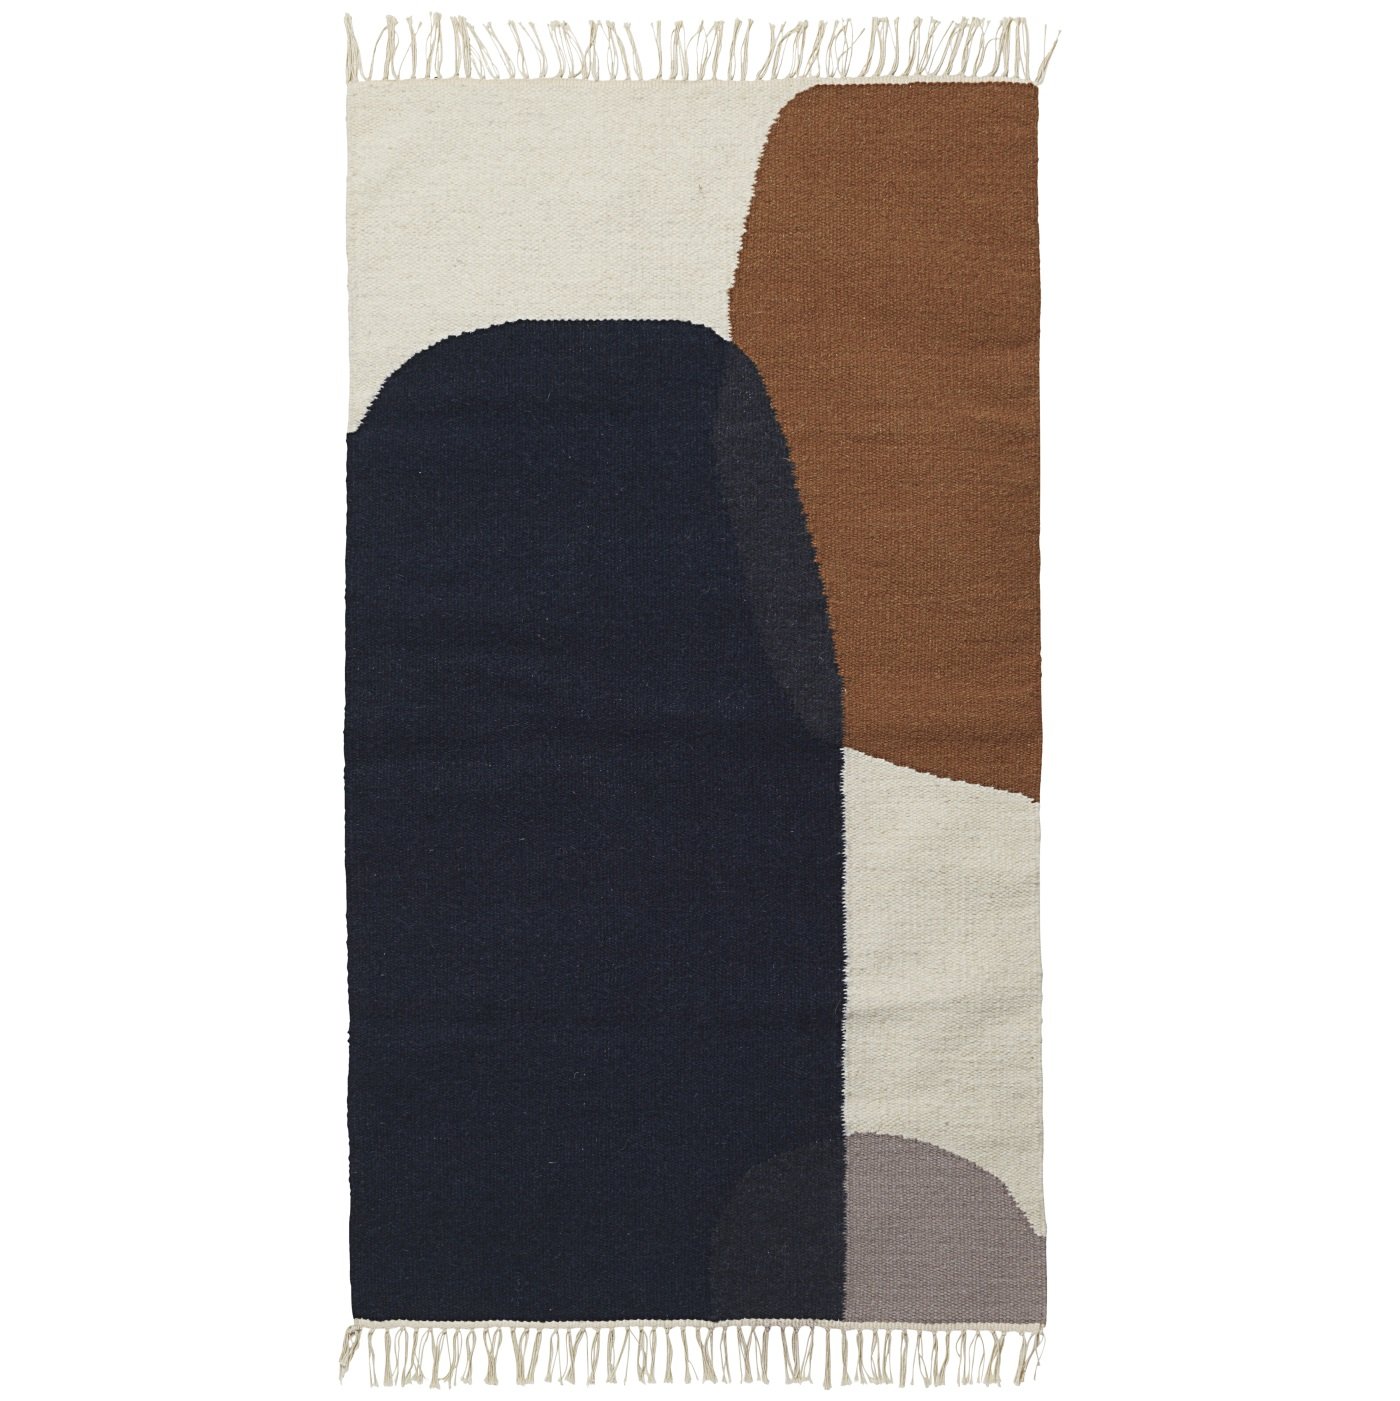 Matta KELIM Merge 80 x 140 cm, Ferm Living